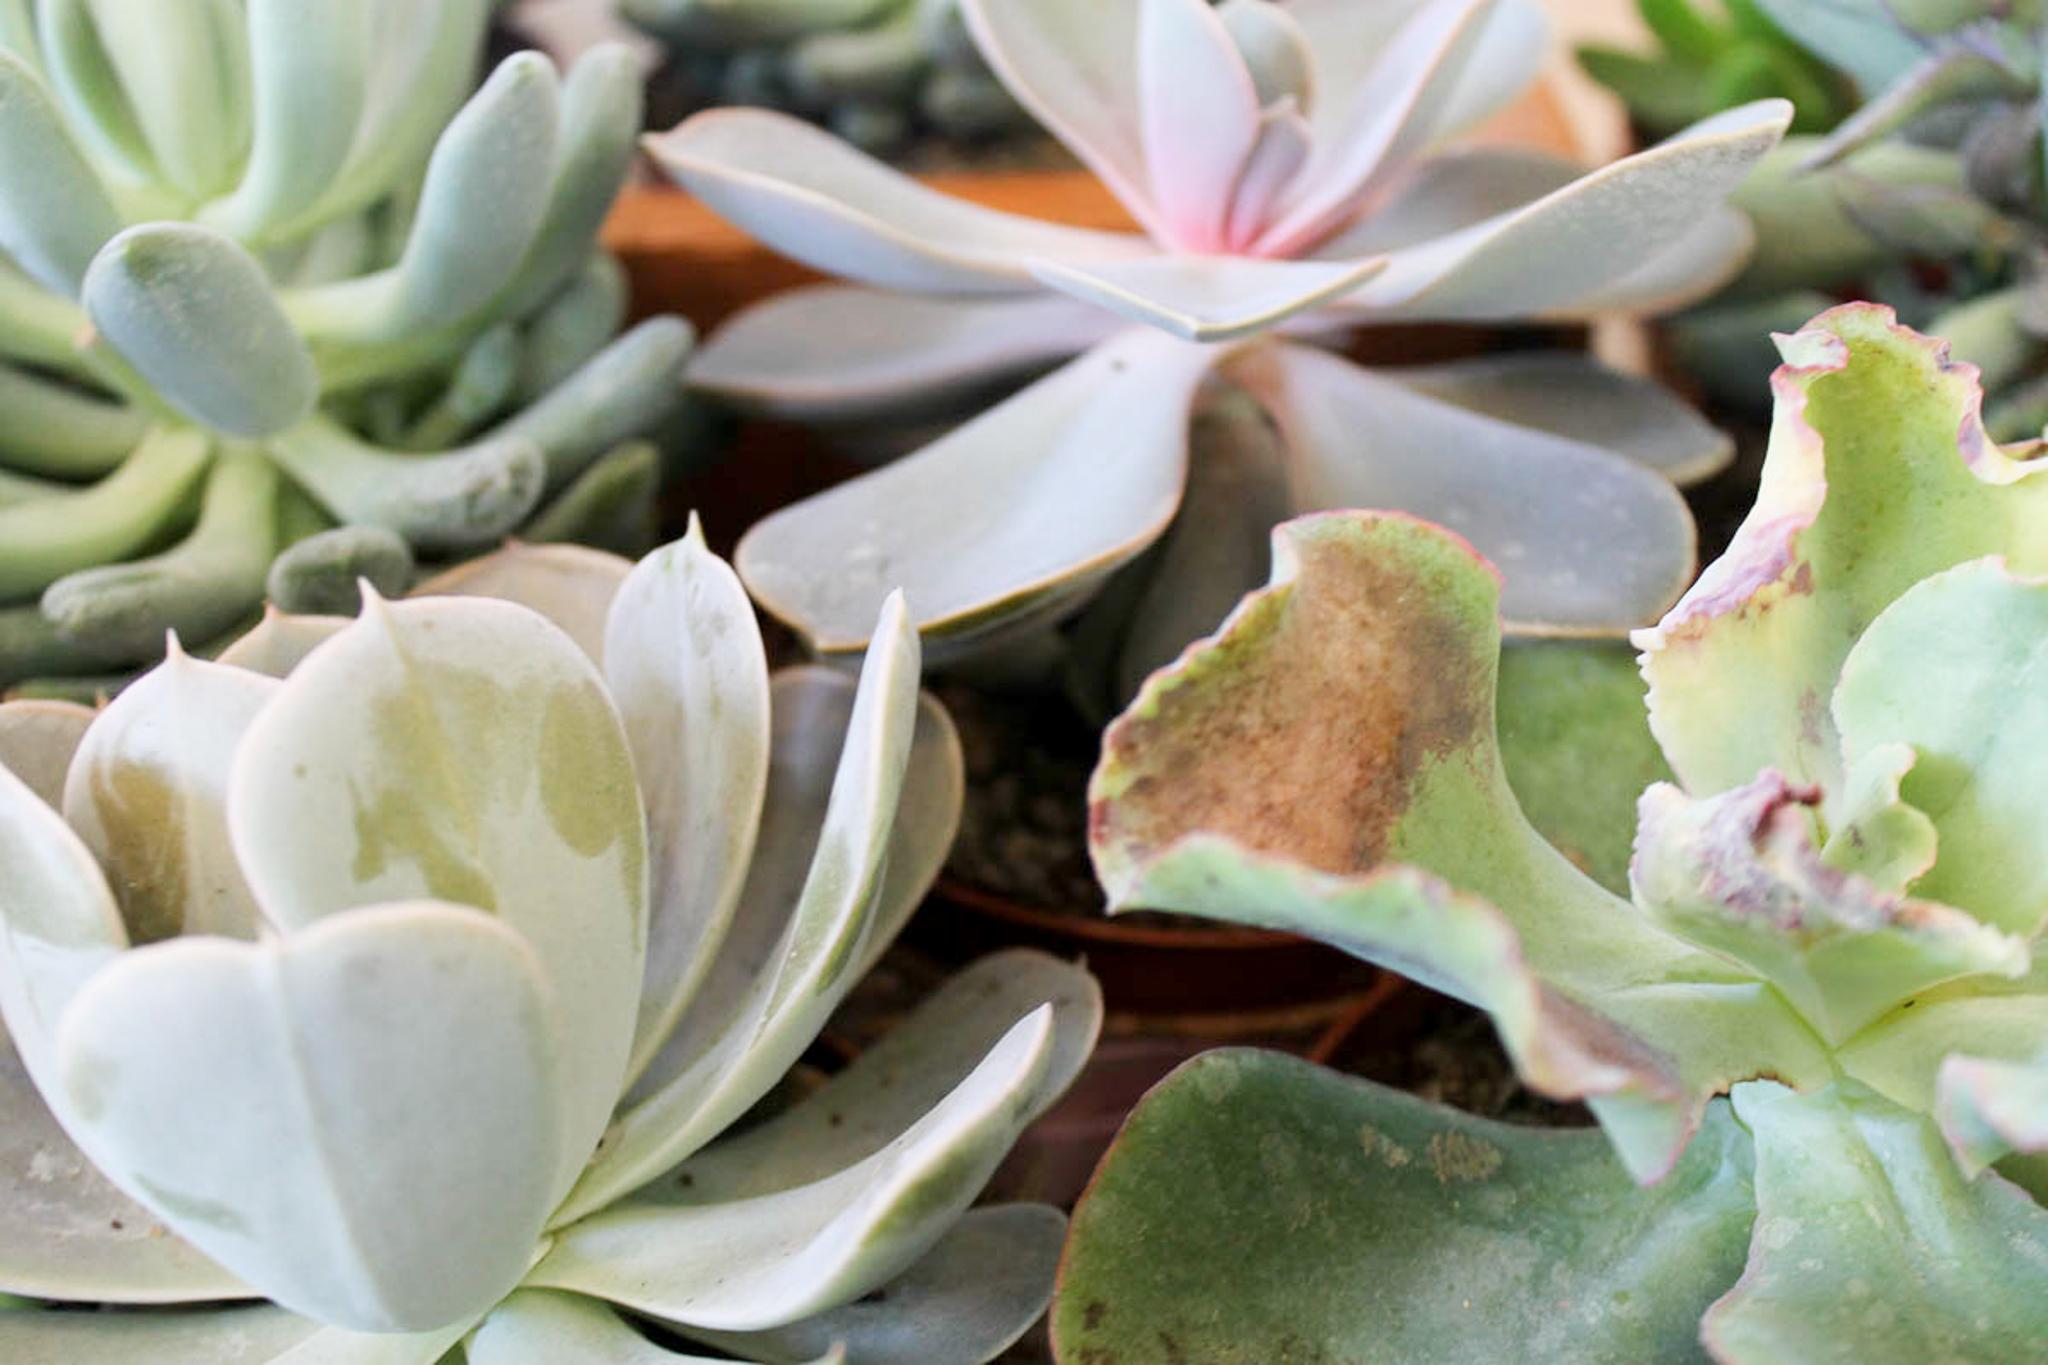 Southern Vintage Baby Shower-favors succulents close up.jpg